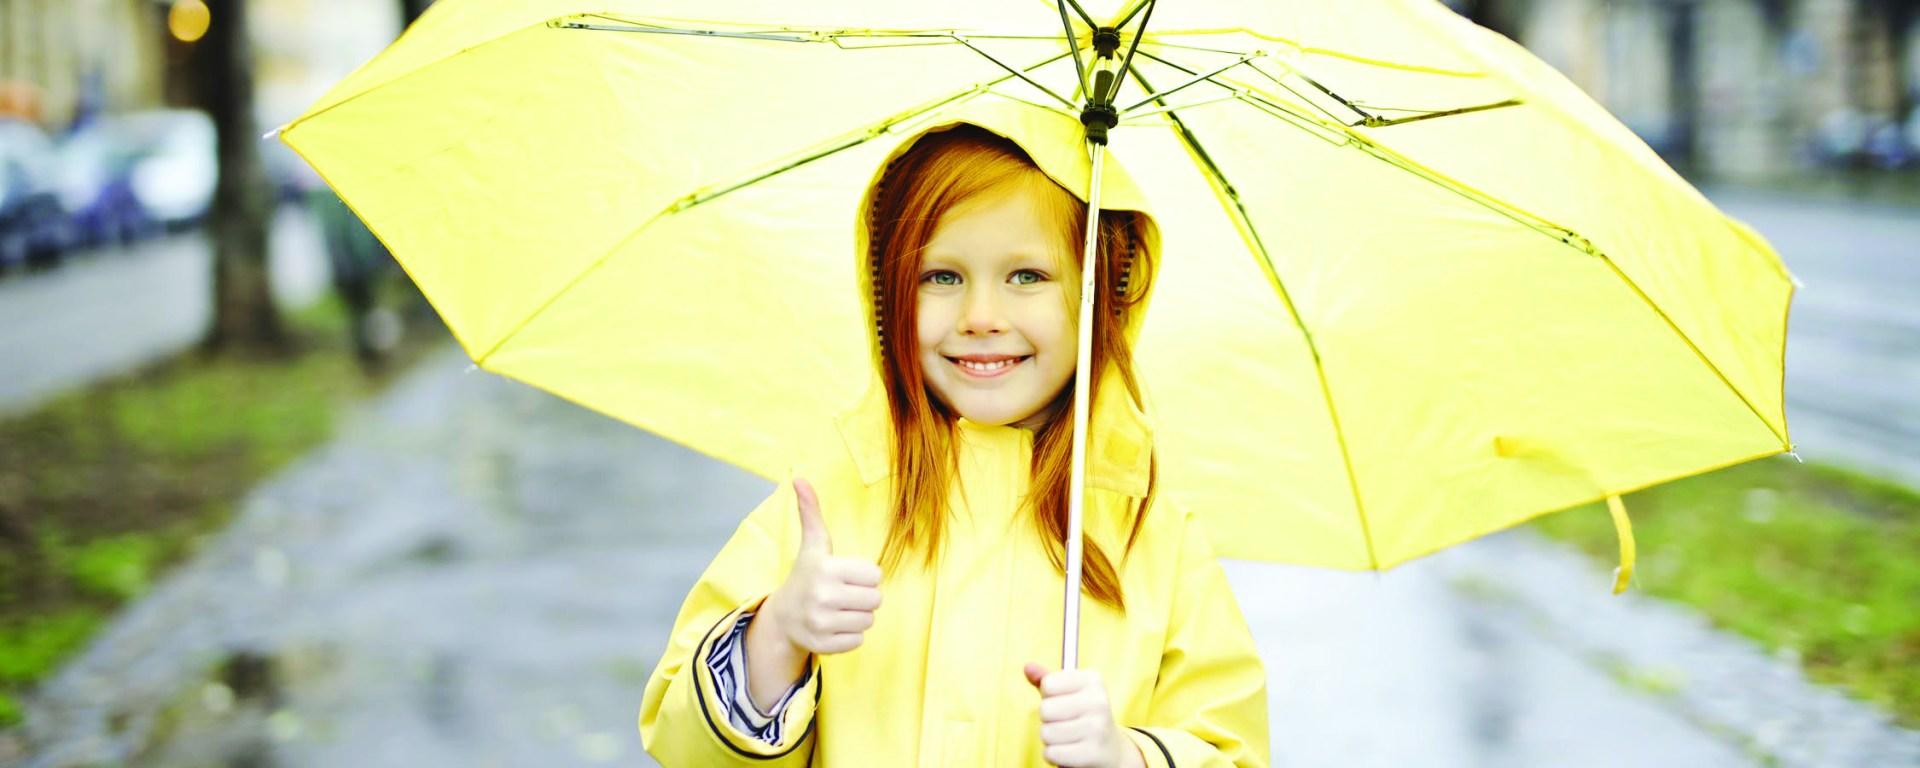 little girl in yellow rain coat under a yellow umbrella